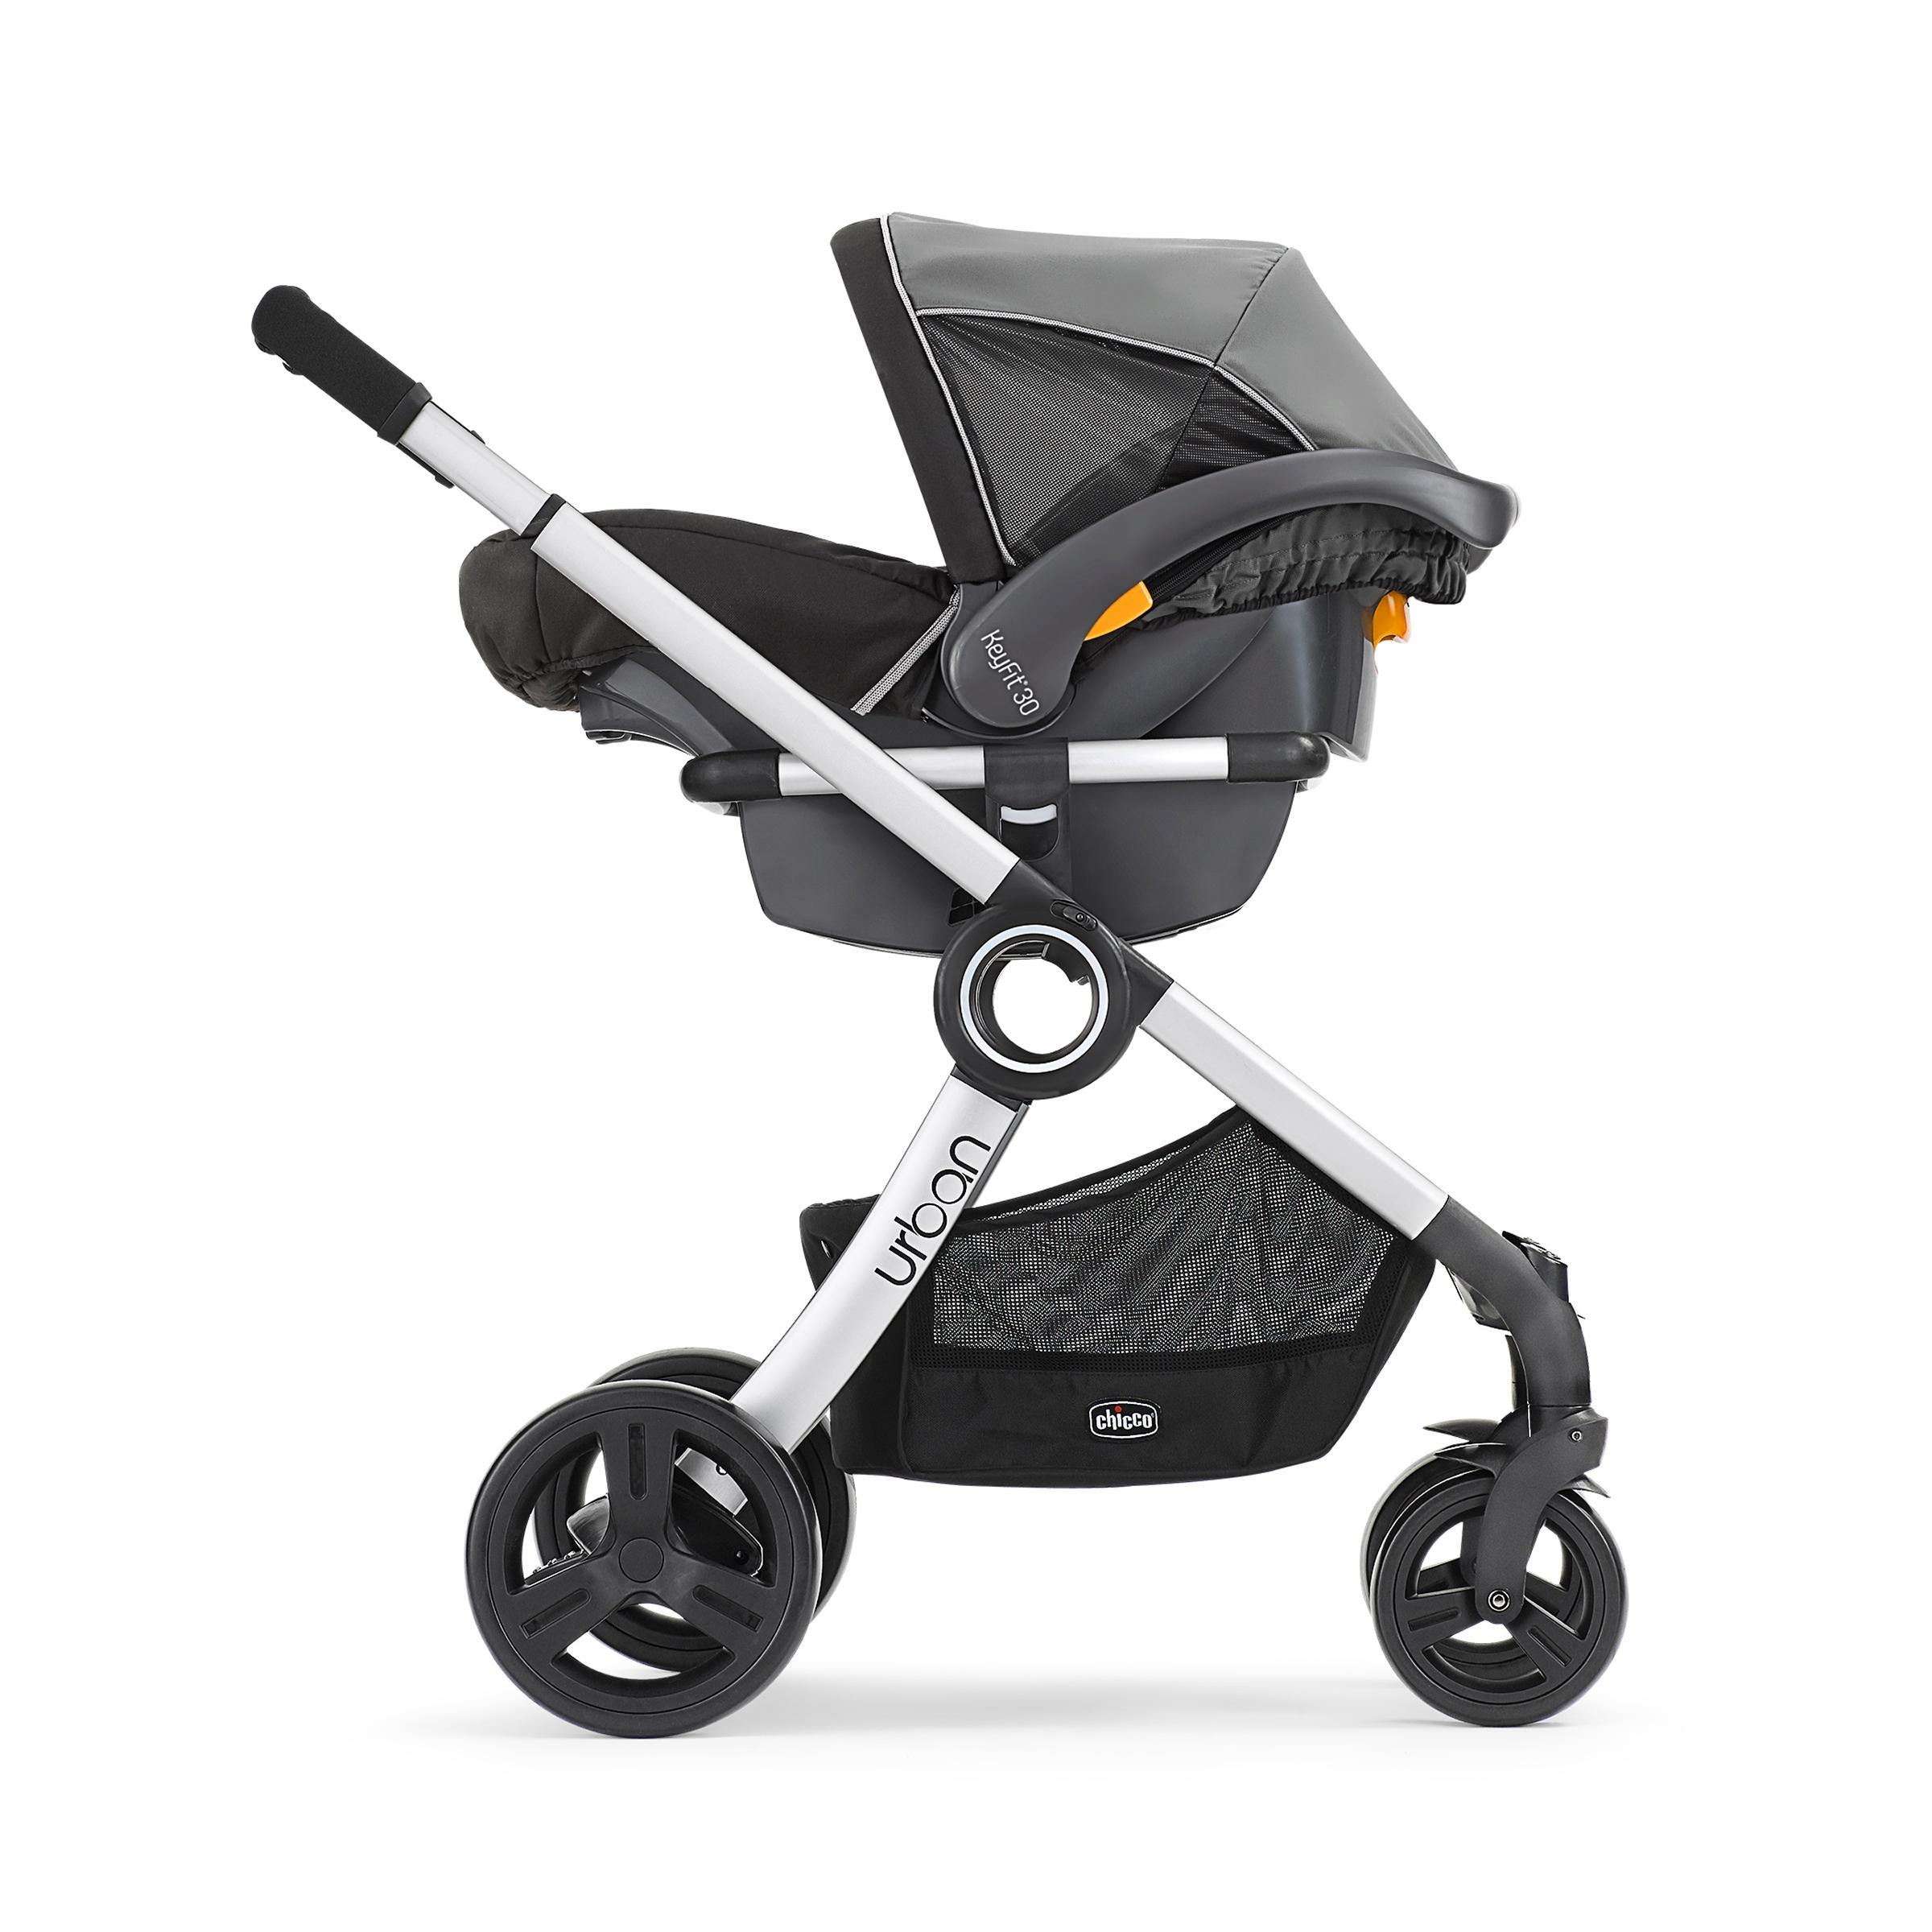 Chicco 6-in-1 Urban Baby Toddler KeyFit Stroller Infant ...